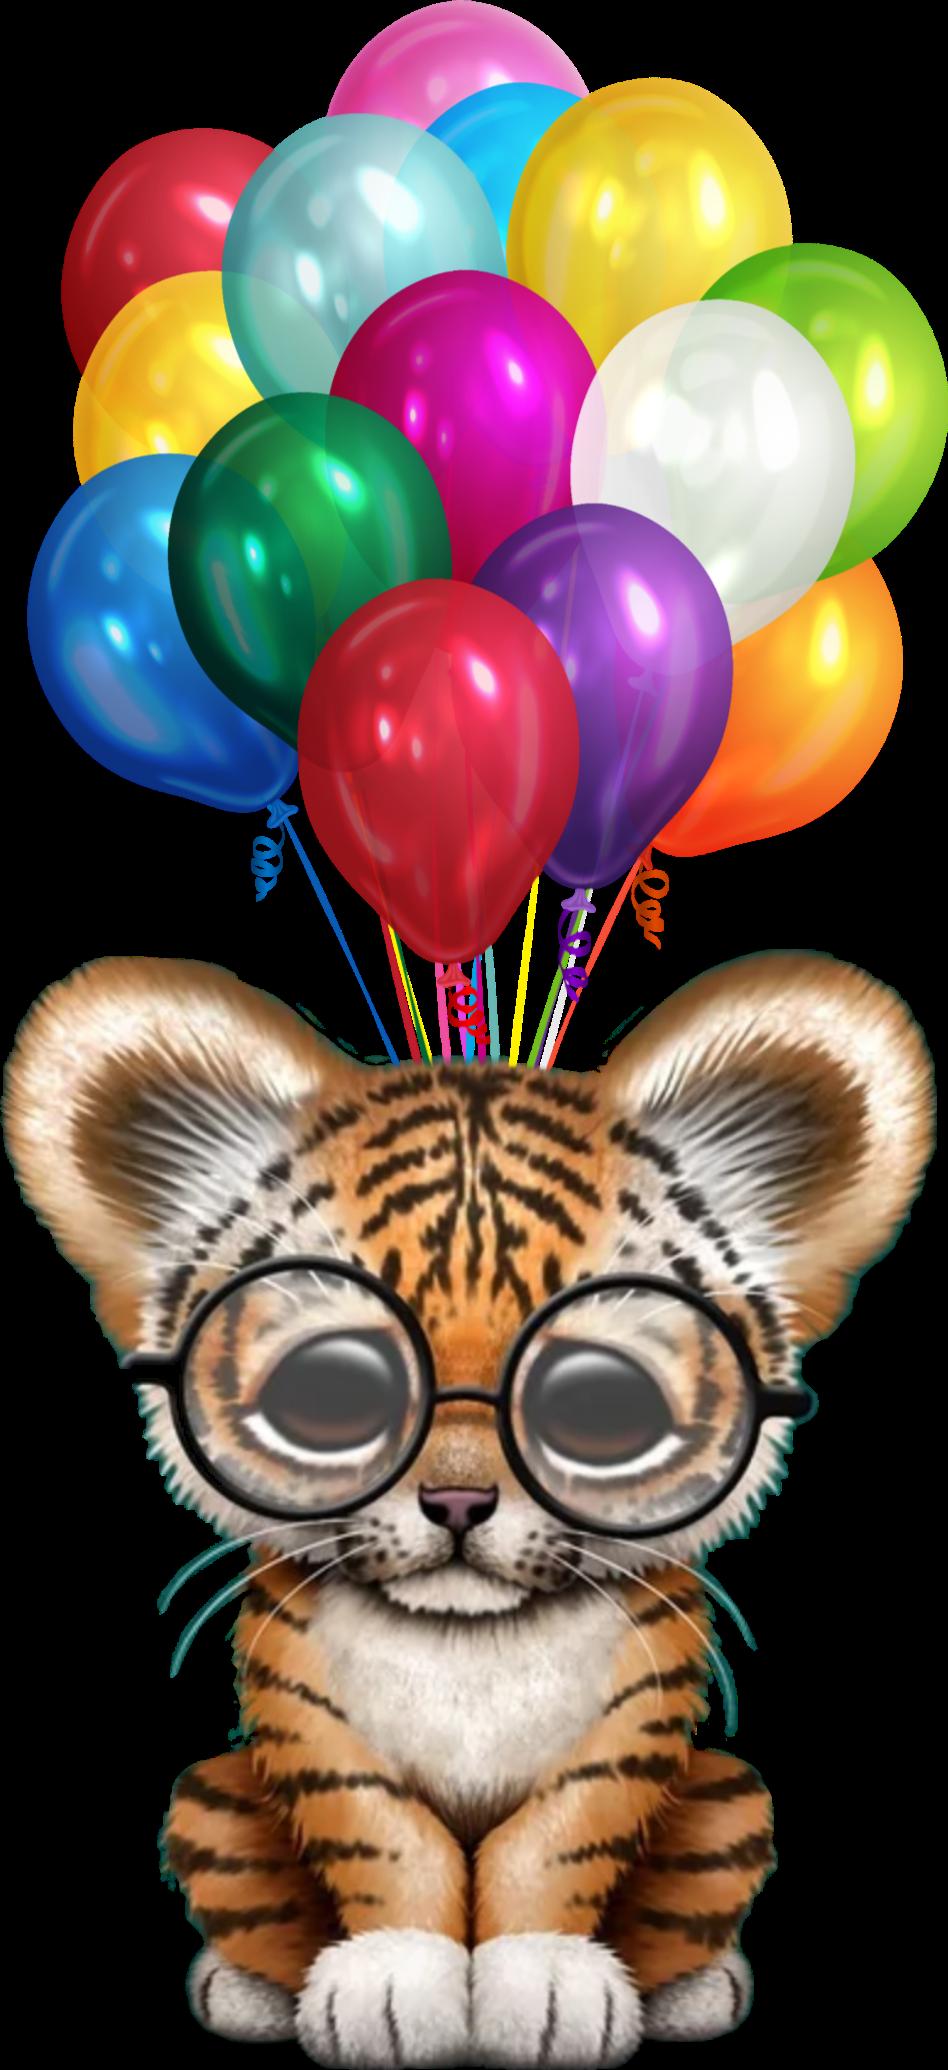 #tiger #balloons